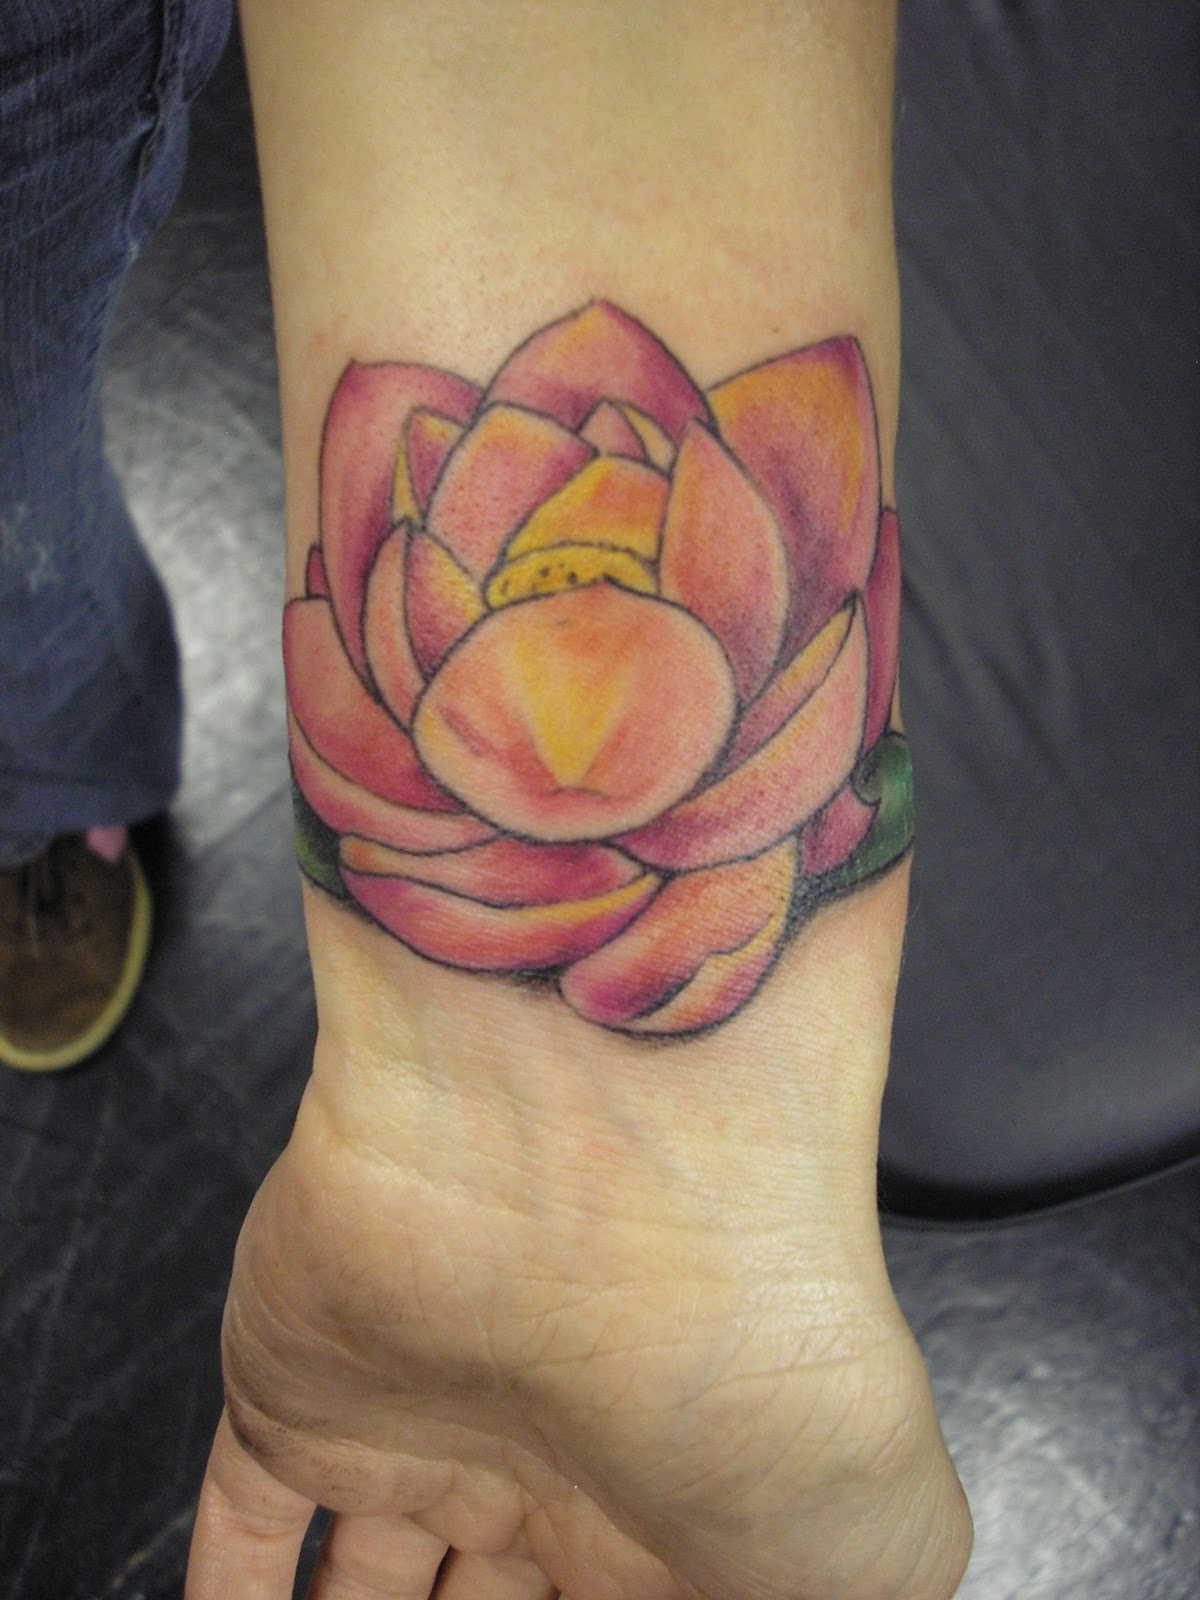 Flower Wrist Tattoos: 60+ Flowers Wrist Tattoos Ideas